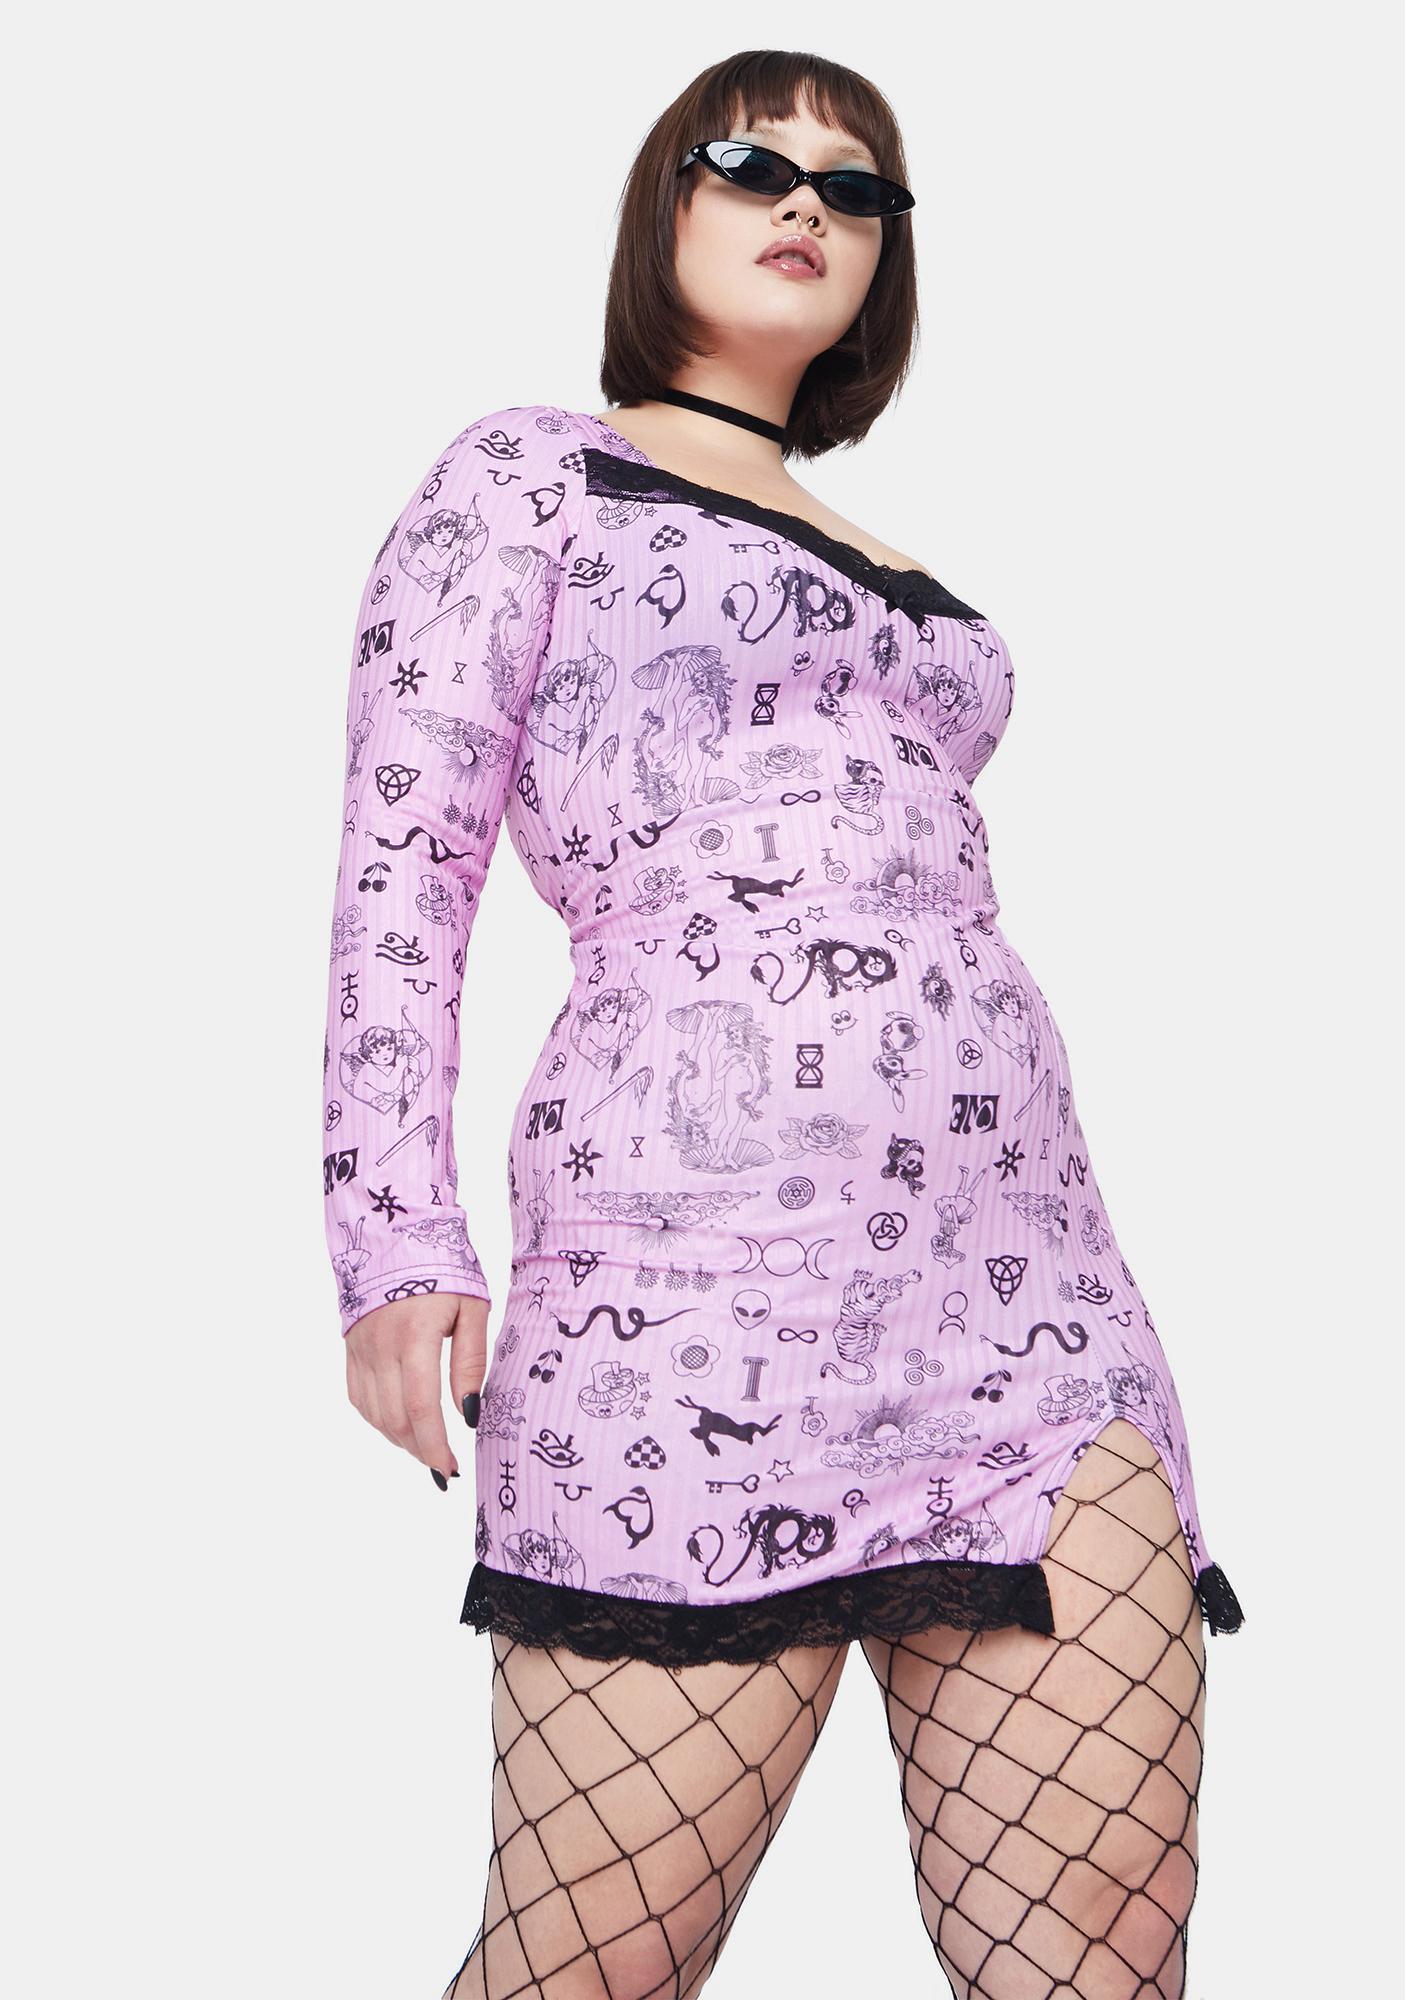 NEW GIRL ORDER Curve Symbols Dress